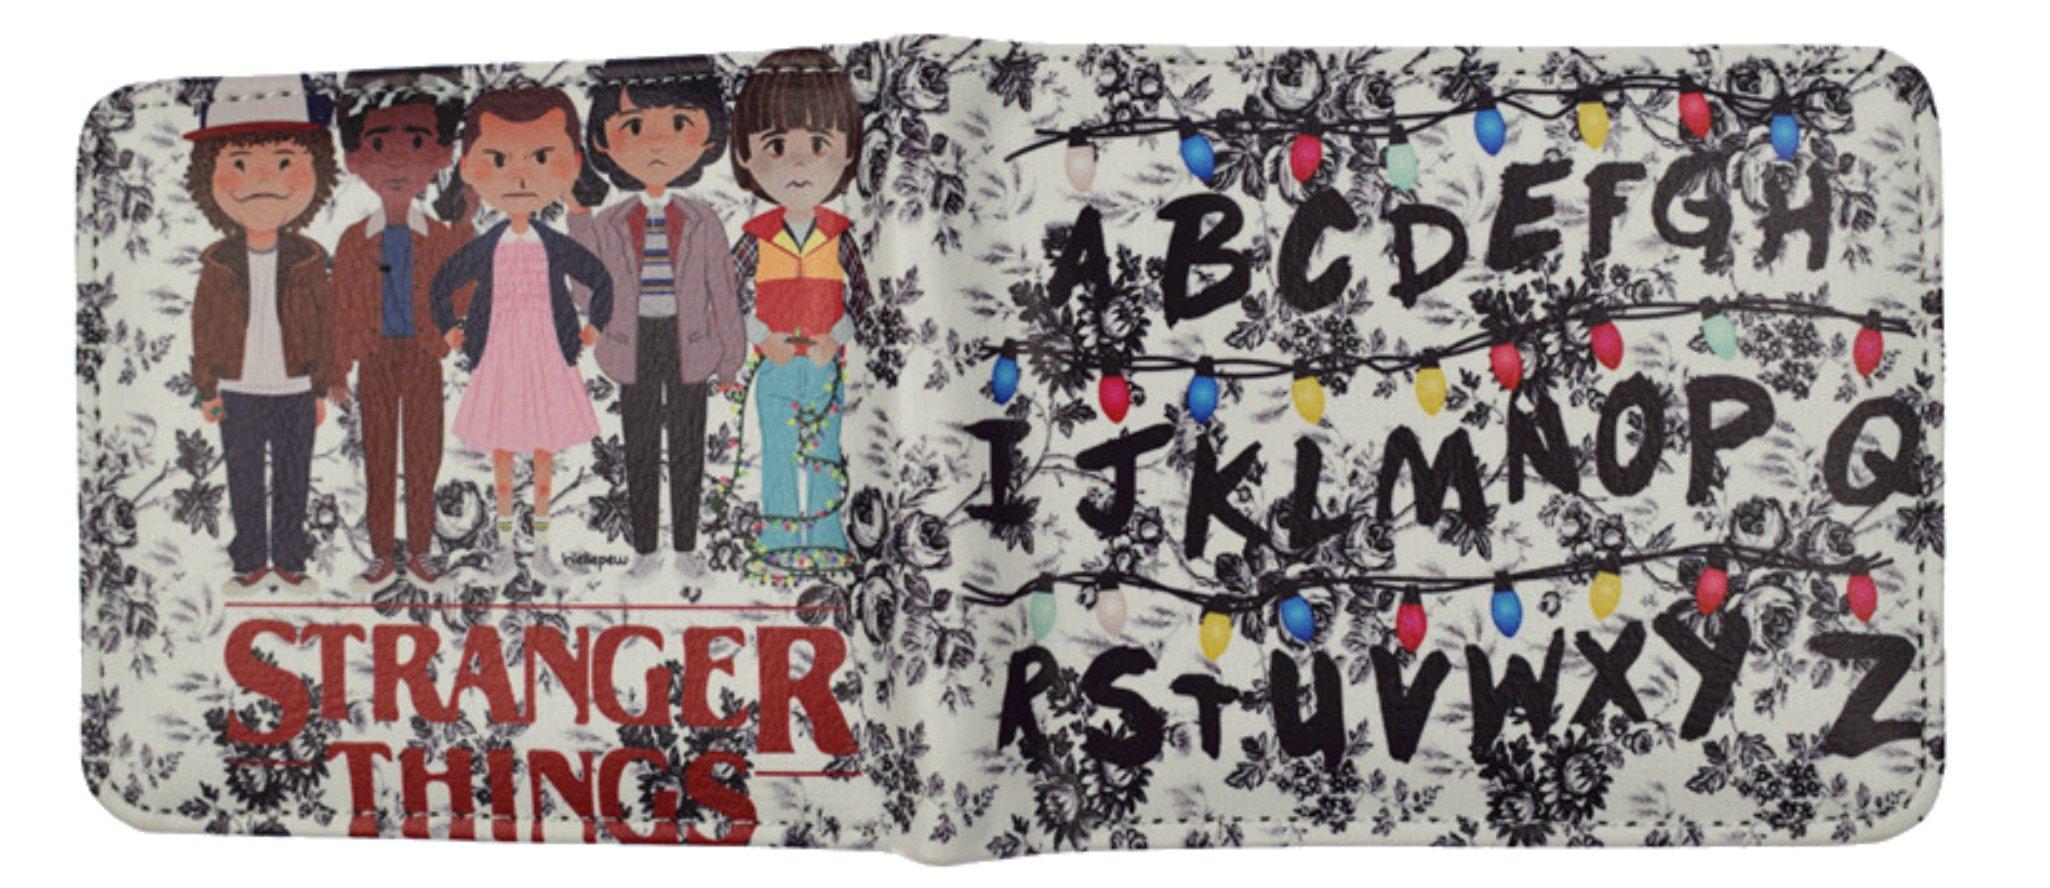 Stranger Things Wallet Bi-Fold Mens Boys NETFLIX TV Series Eleven Movies Cartoon Logo Theme Premium Quality Detailed Cosplay Gift Series